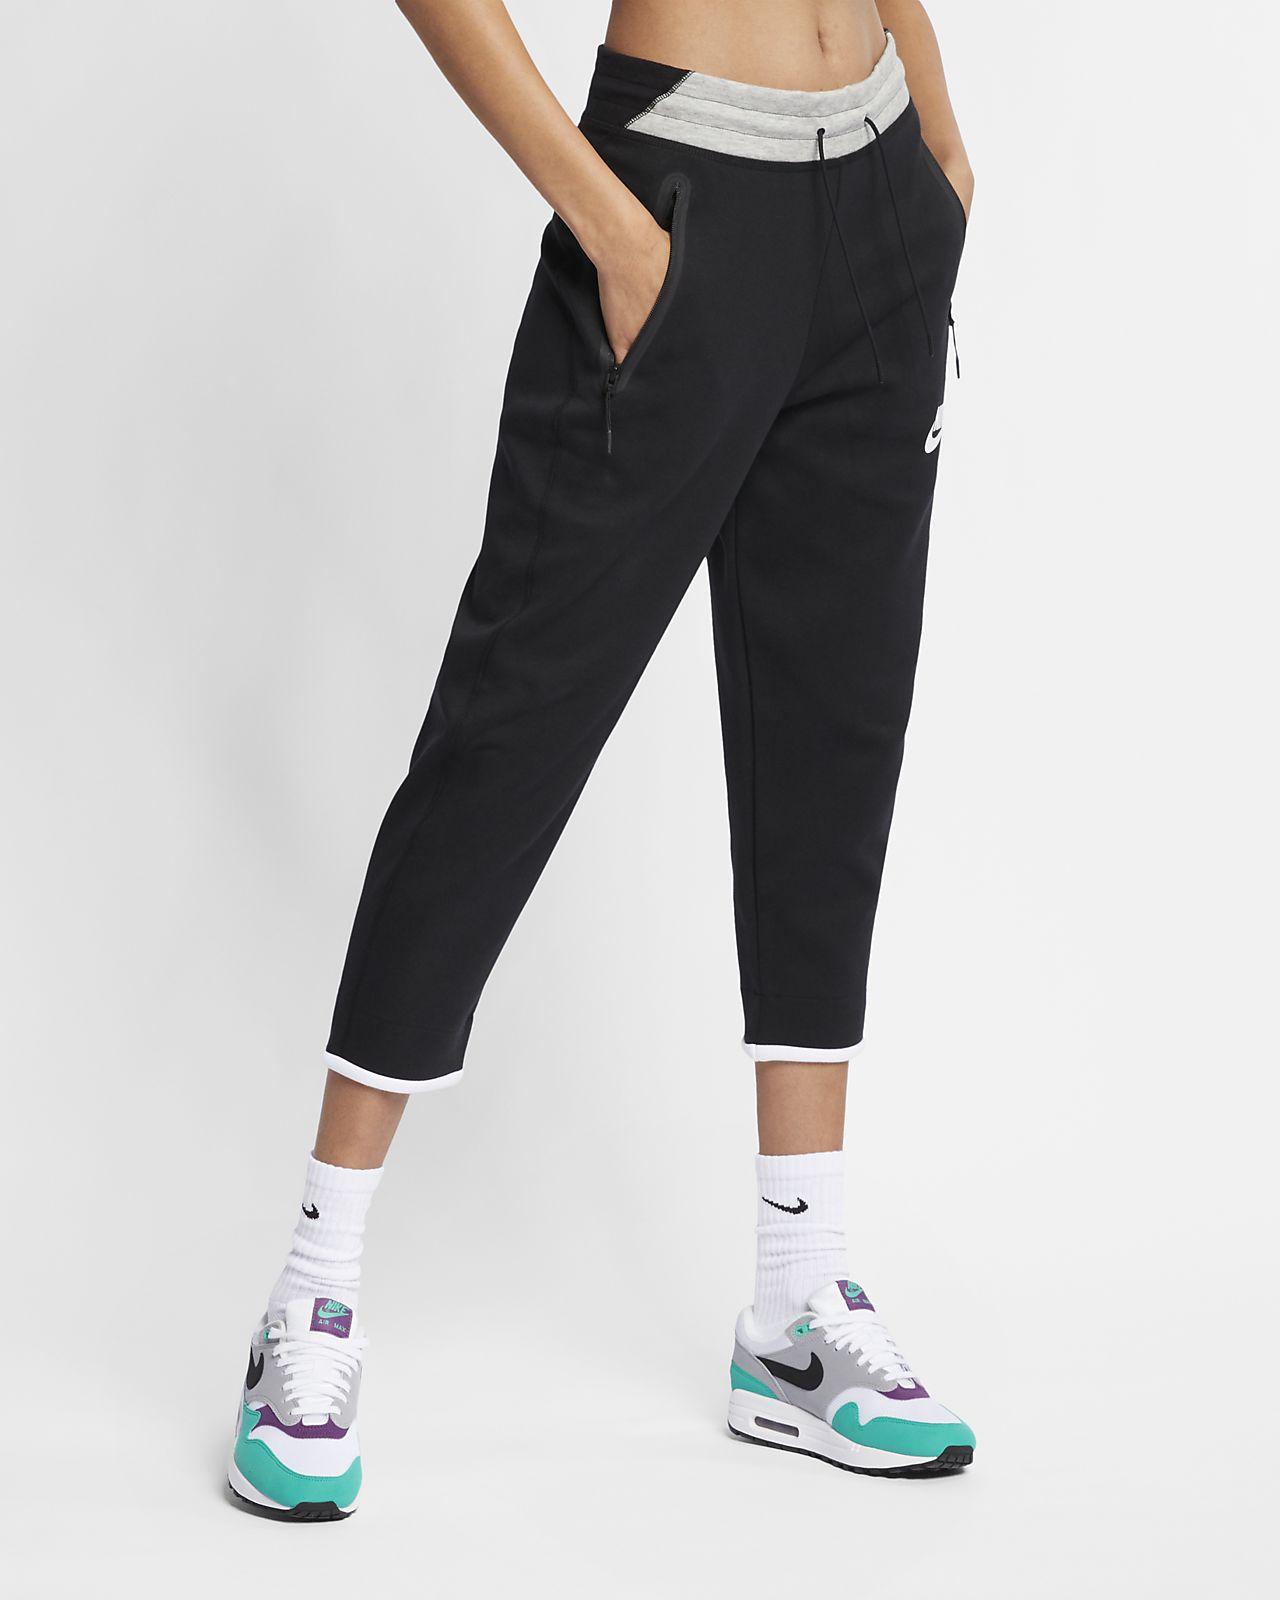 302d44c8d18e8 Nike Sportswear Tech Fleece Pantalón - Mujer. Nike.com ES